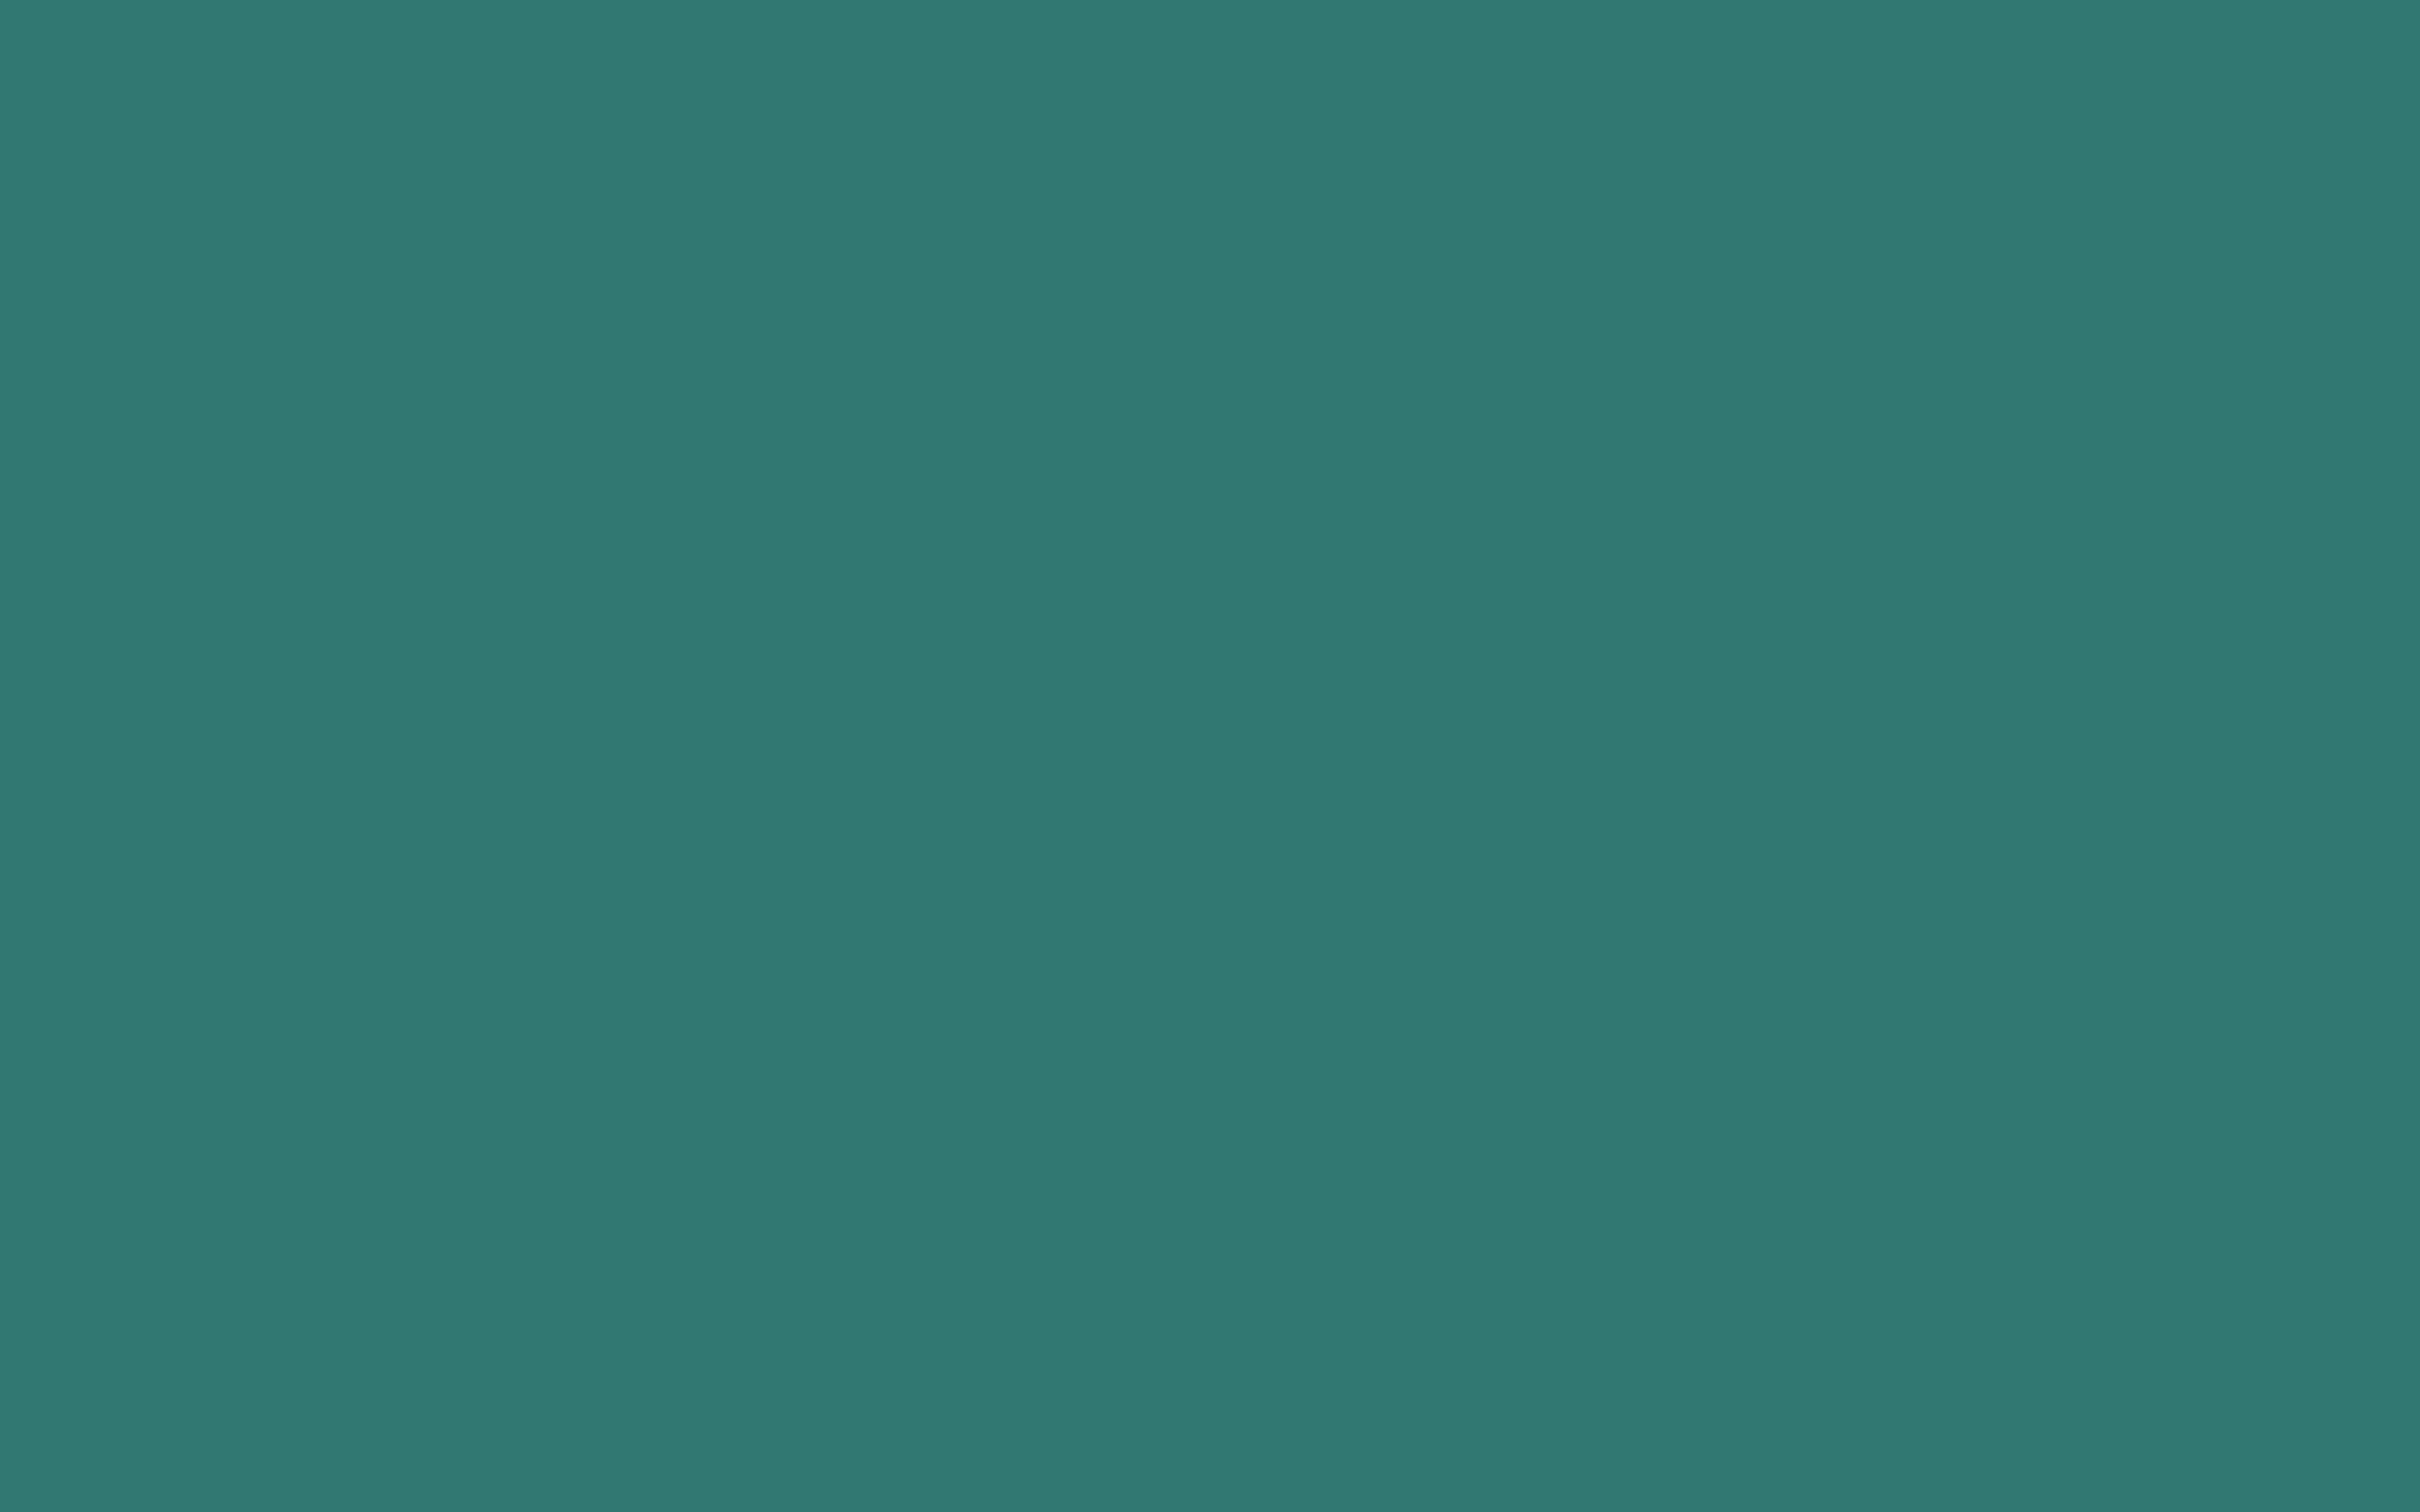 2560x1600 Myrtle Green Solid Color Background